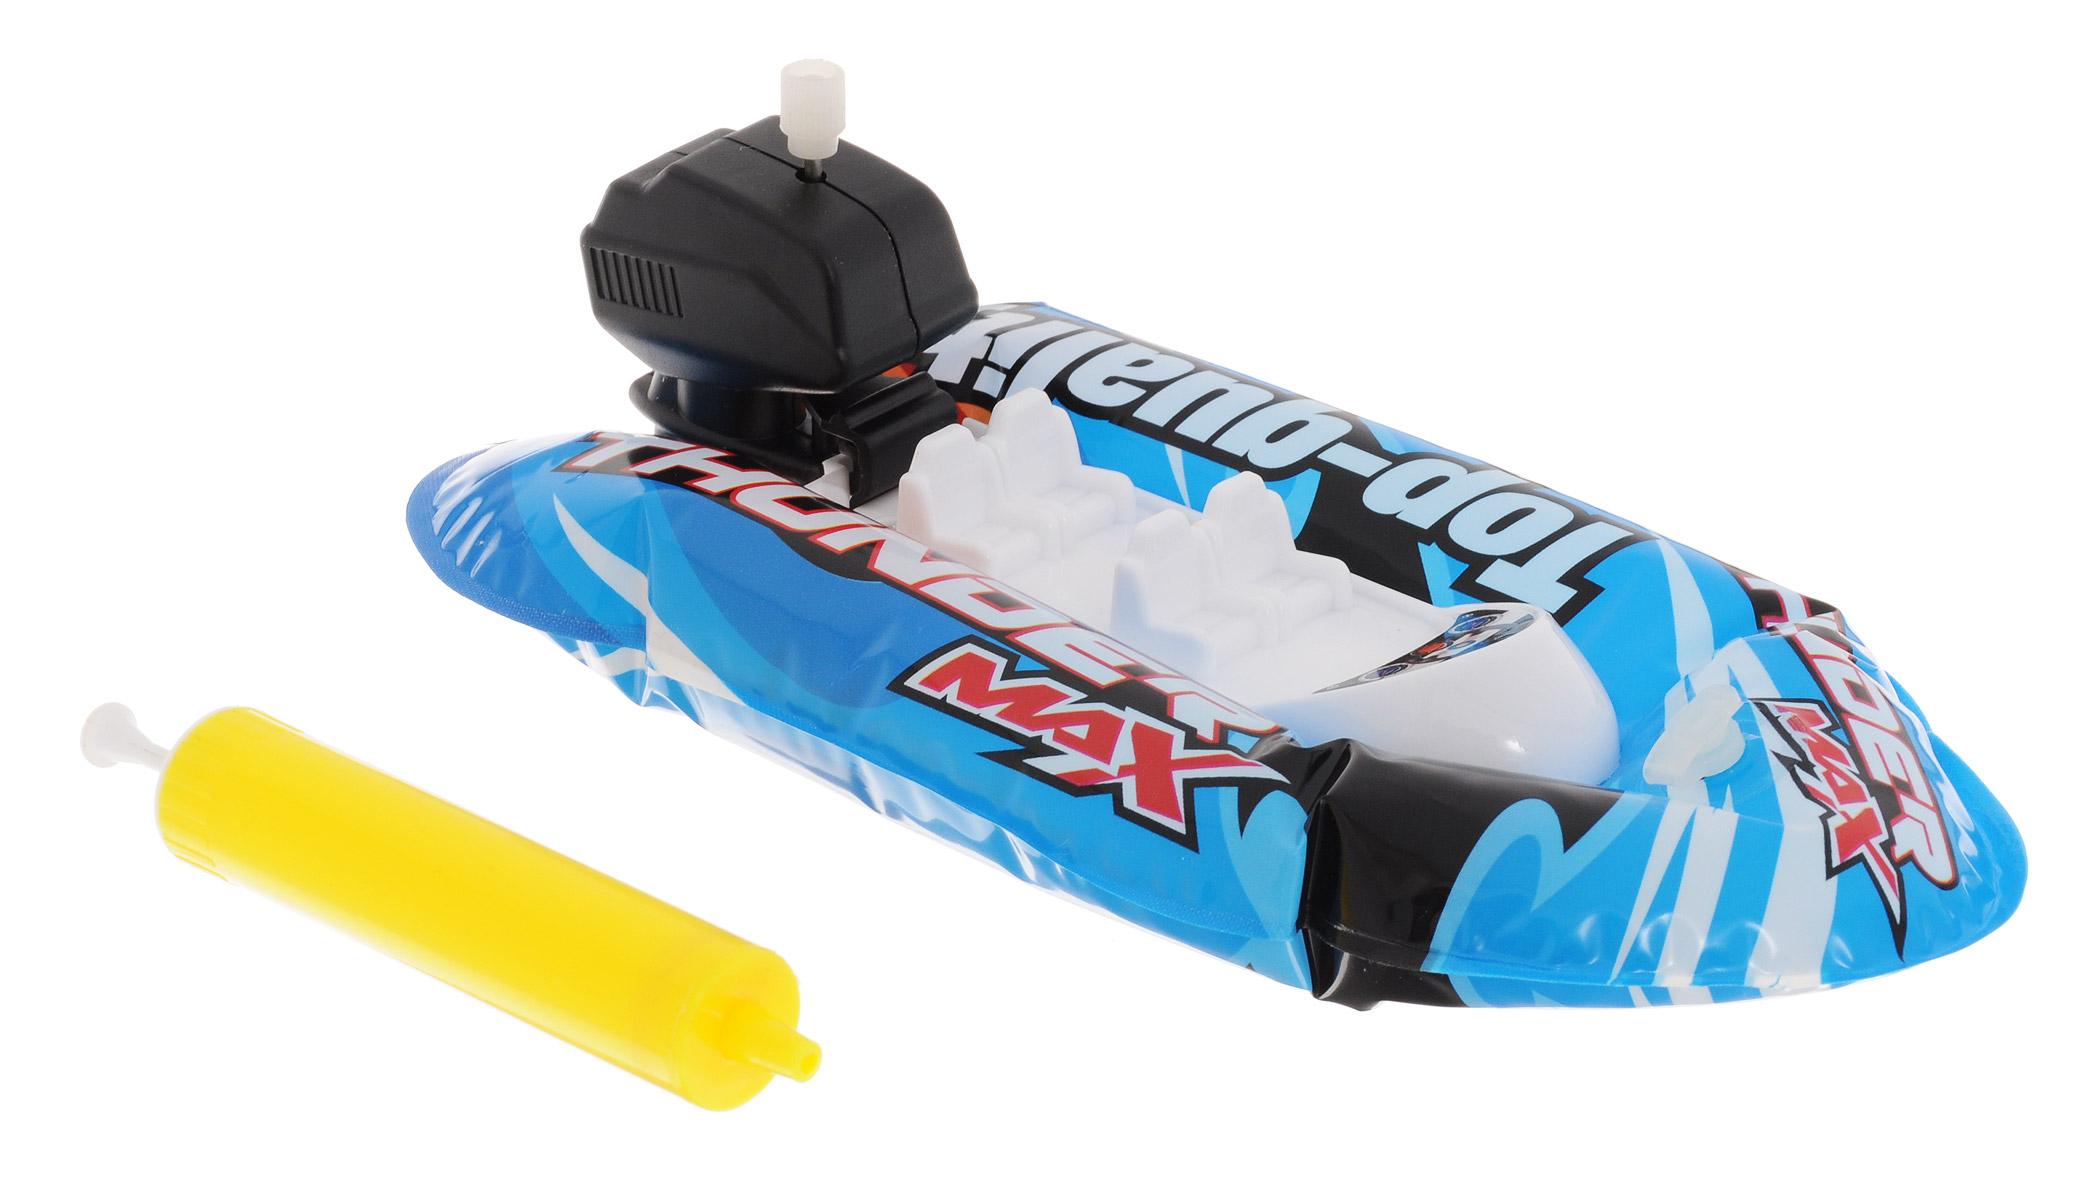 Pilotage Надувная лодка Fun Boat c насосом цвет синий